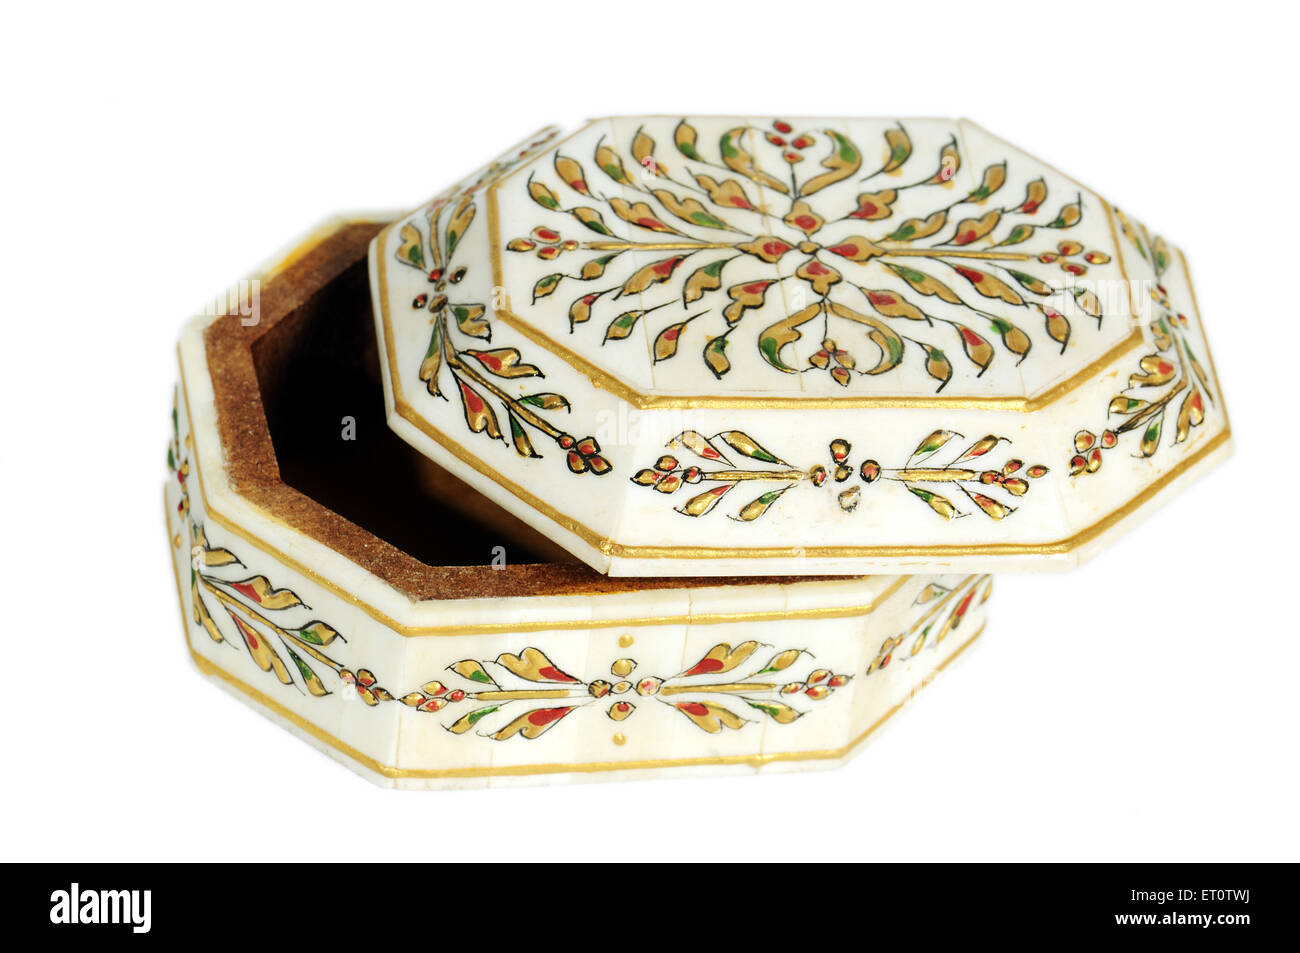 Handicraft ; design on box ; India - Stock Image